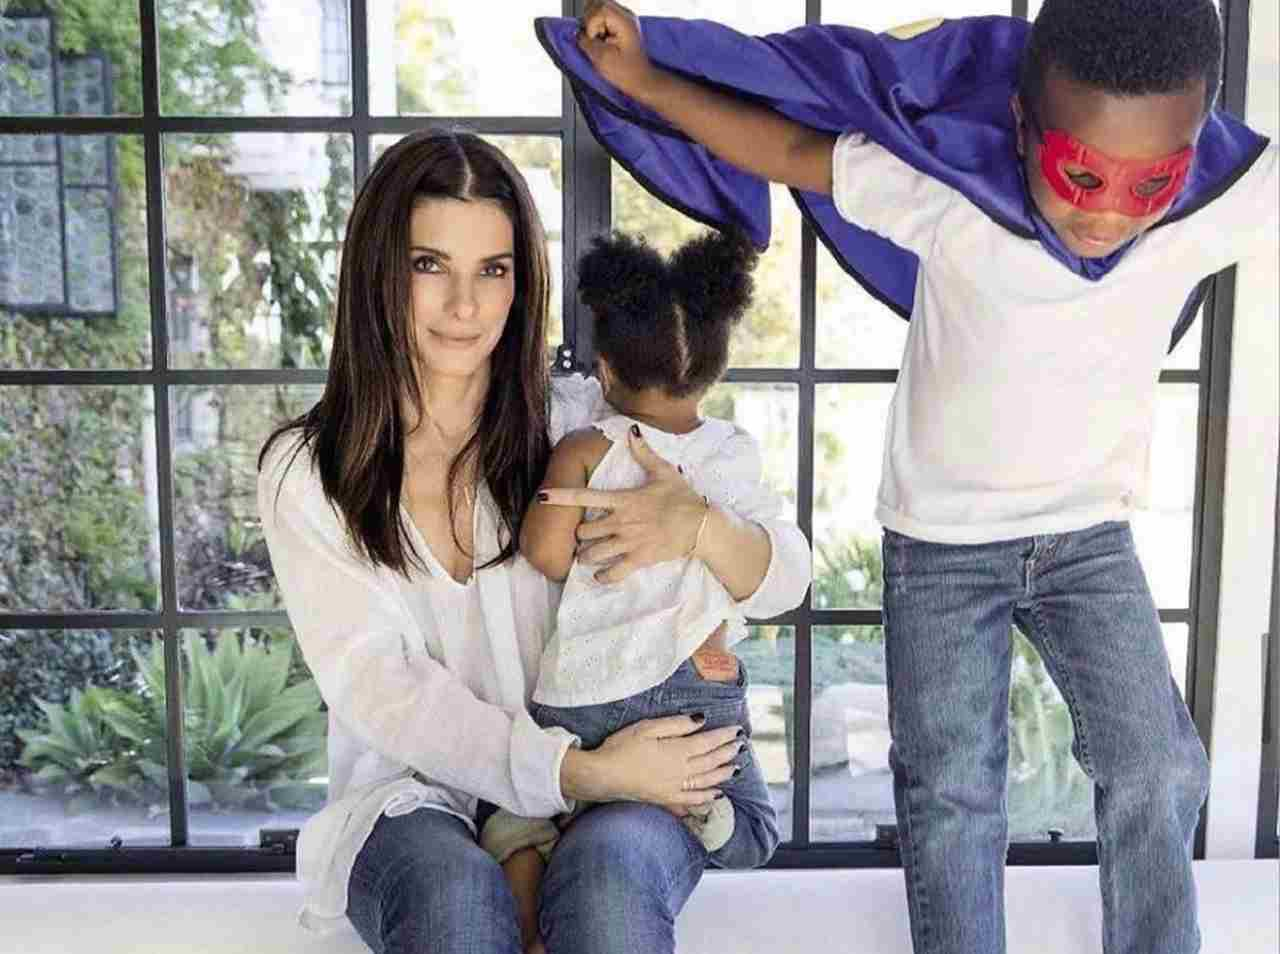 Sandra Bullock e figli (fonte Instagram @sandra.bullock.official)